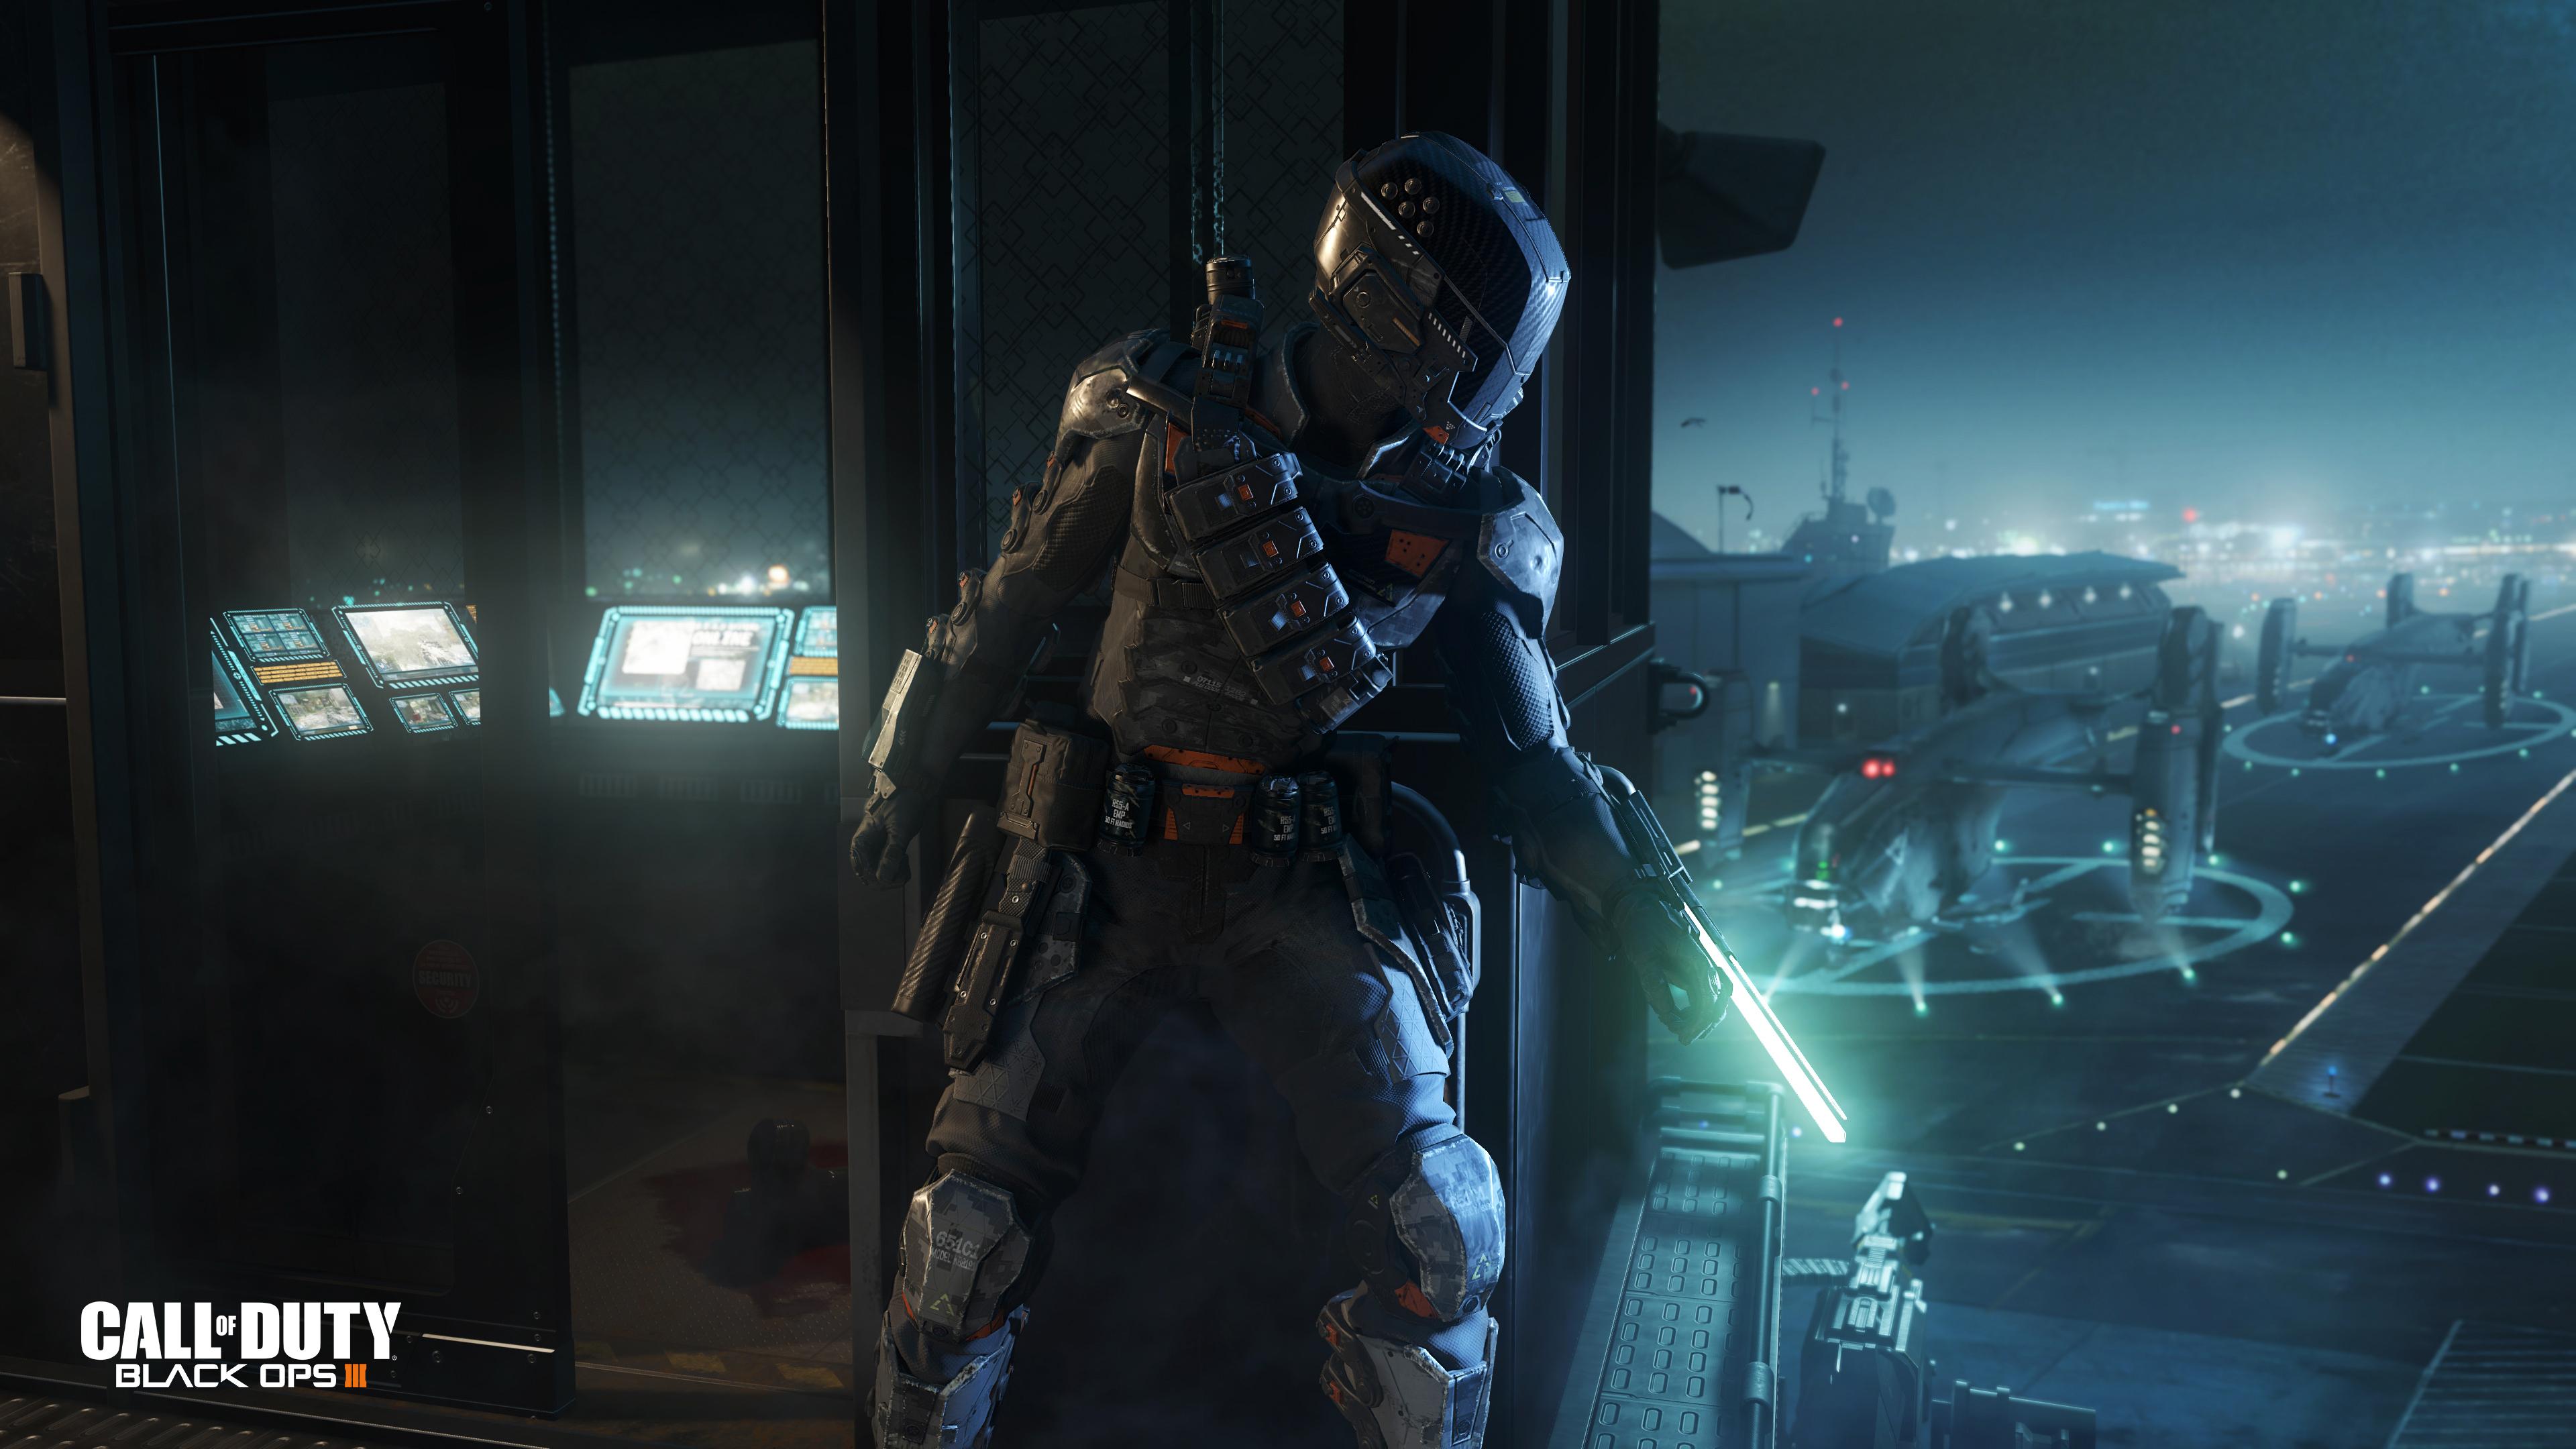 Detalles de Call of Duty Black Ops III   PlayStation 3   Nuevo 3840x2160